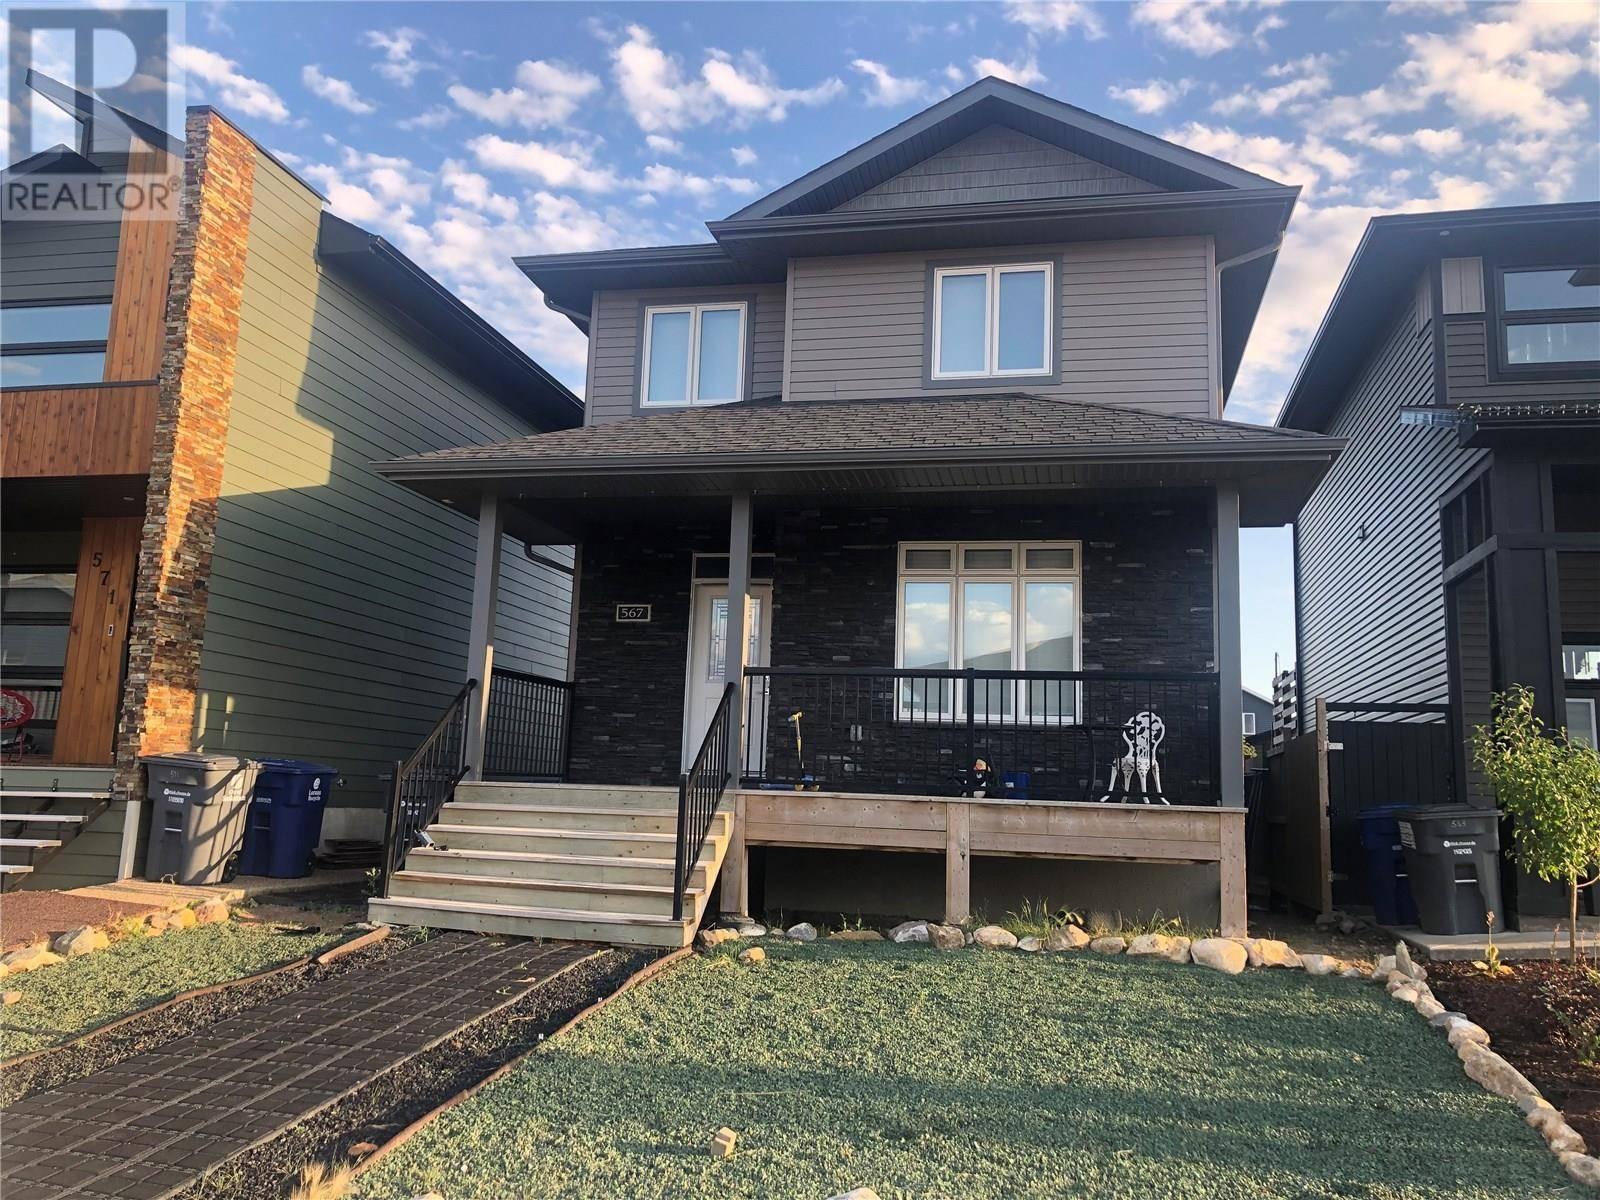 House for sale at 567 Kloppenburg Cres Saskatoon Saskatchewan - MLS: SK785857